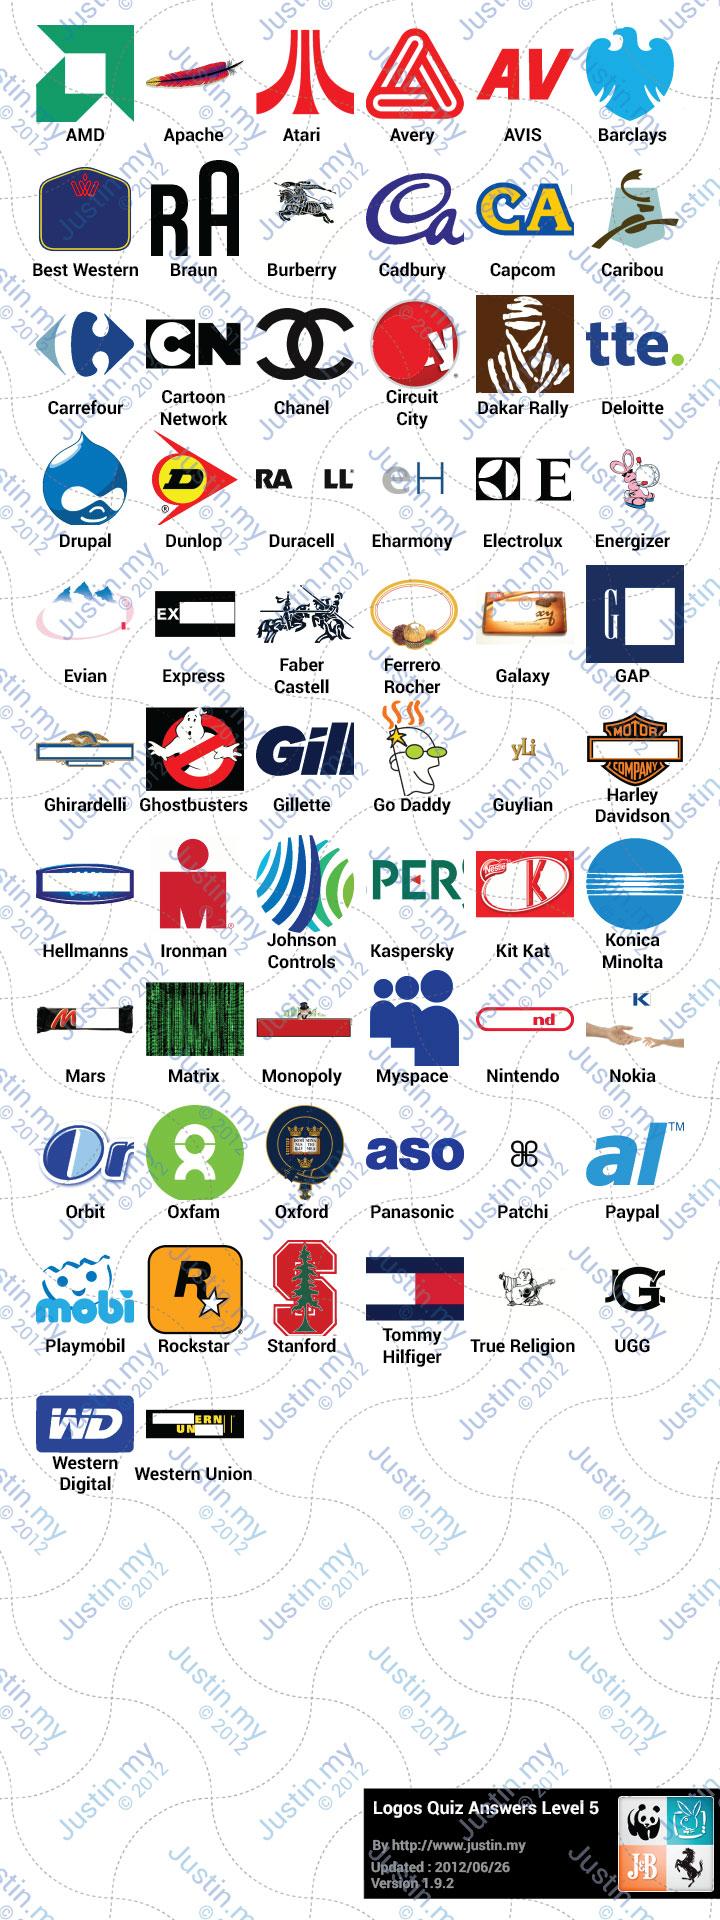 Logos Quiz Answers Level 5